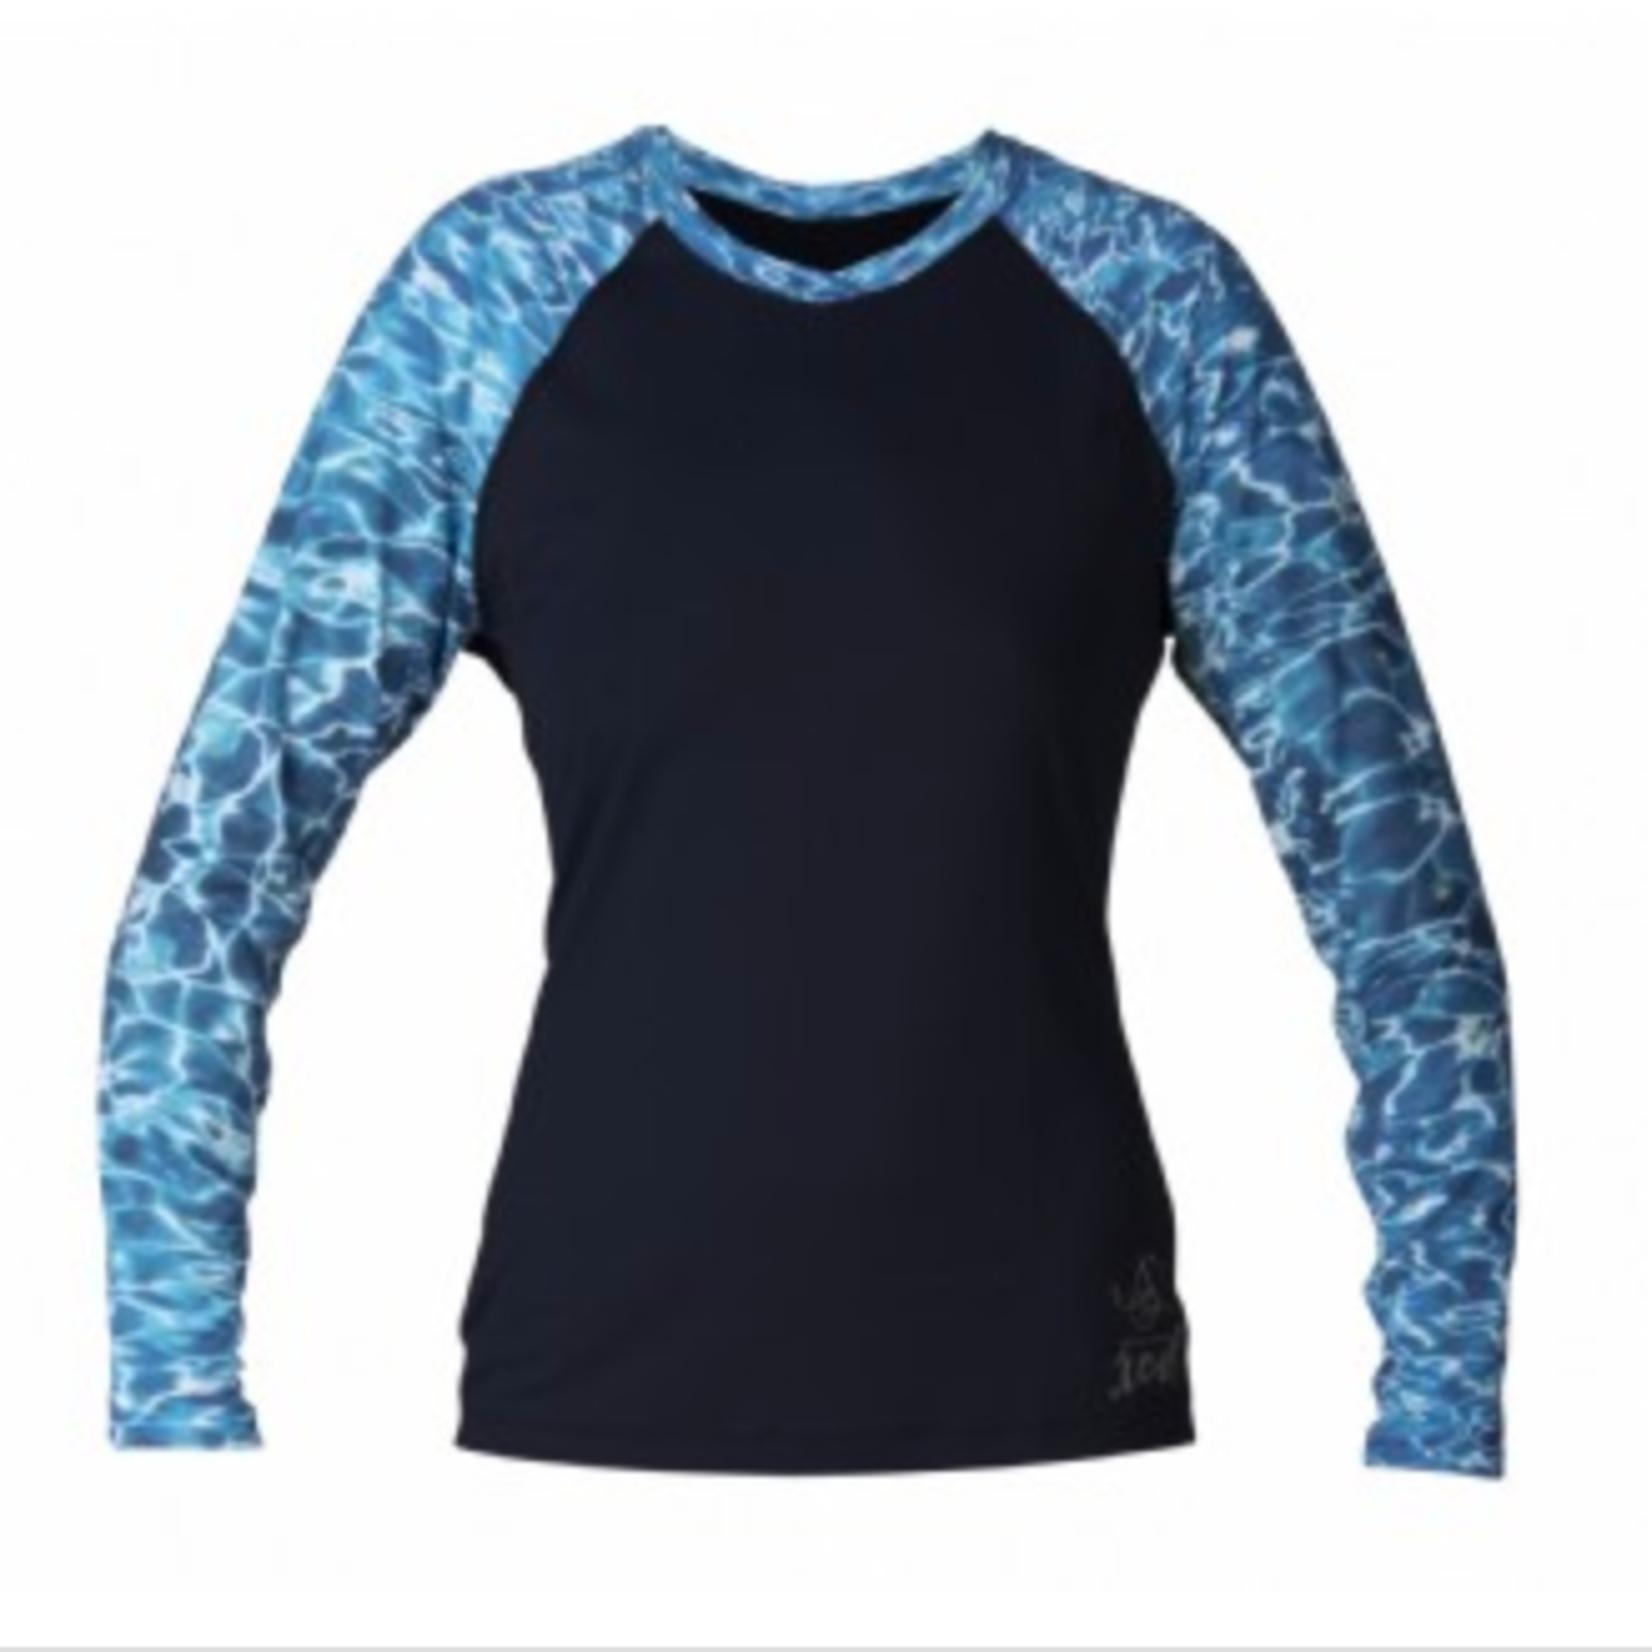 XCEL XCEL Women's Water inspired 6 OZ Long Sleeved.